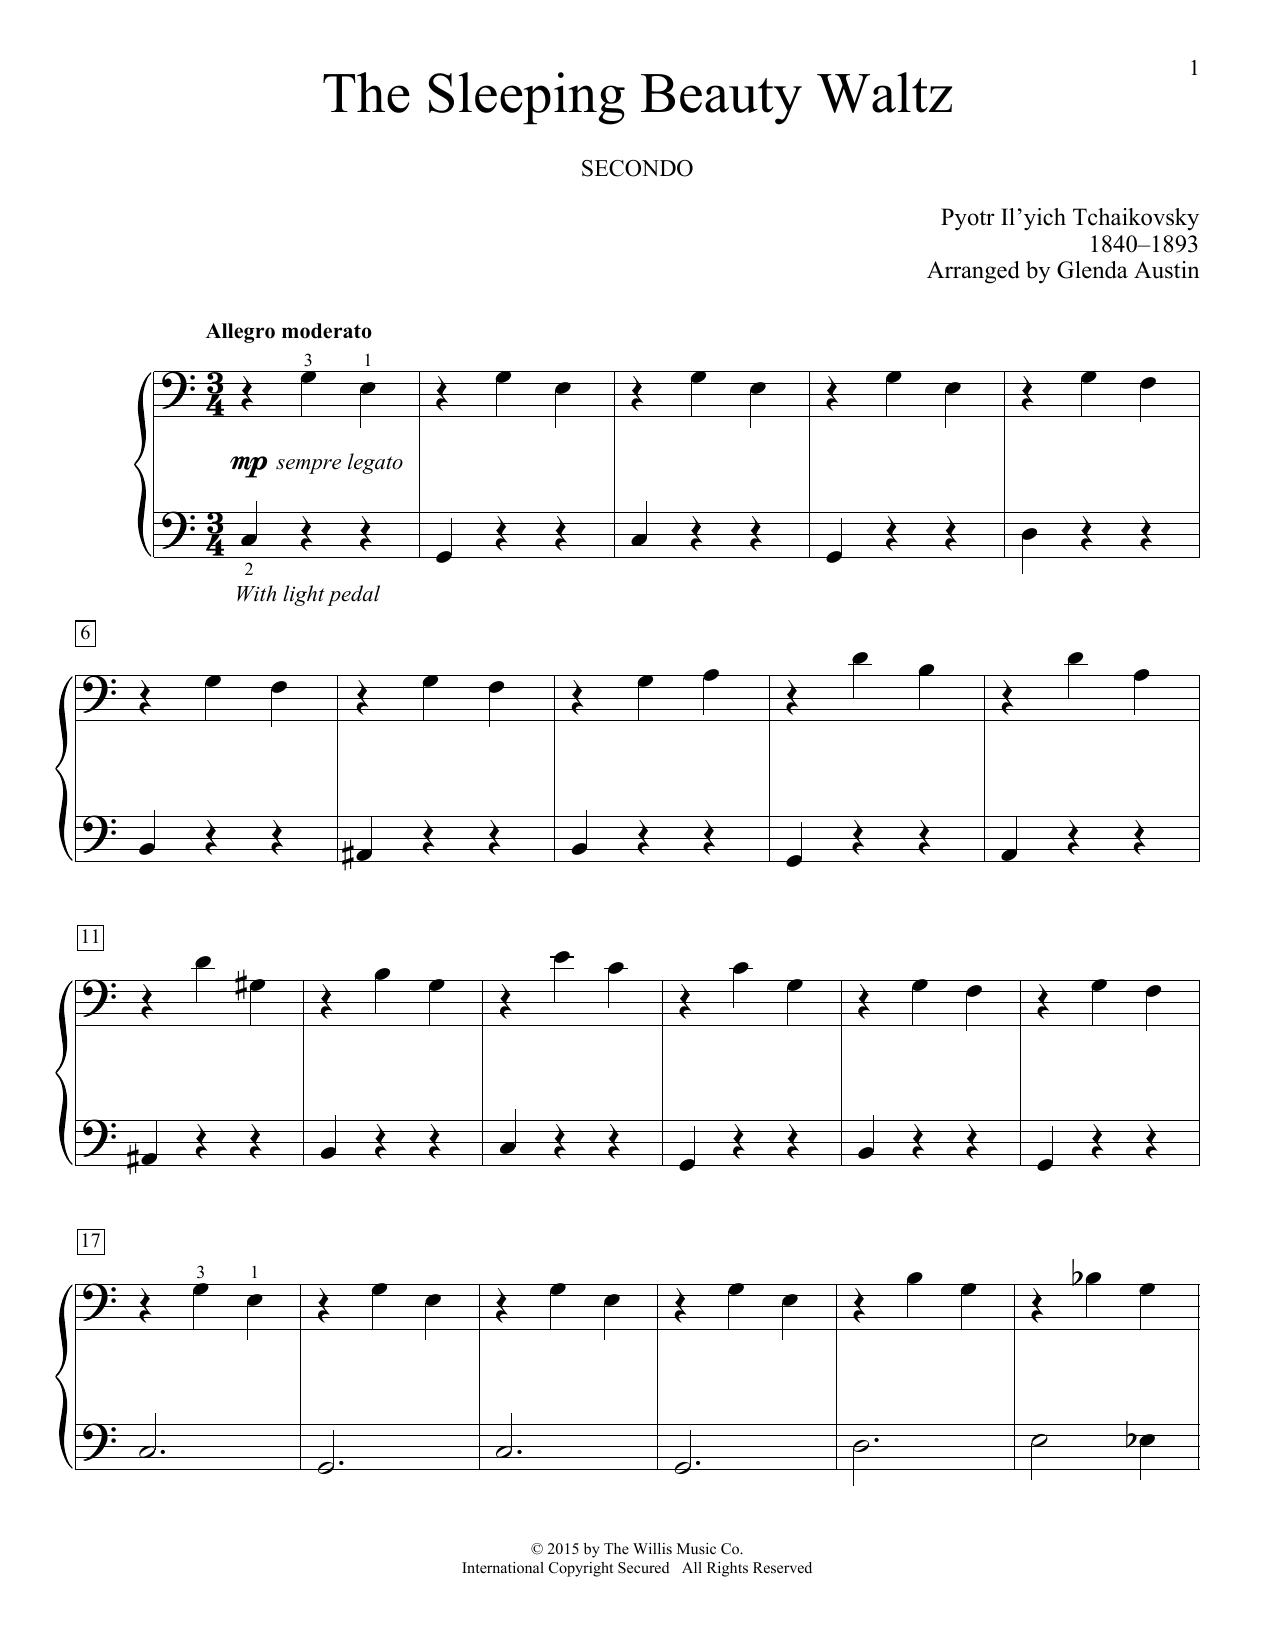 Partition piano The Sleeping Beauty Waltz de Glenda Austin - 4 mains